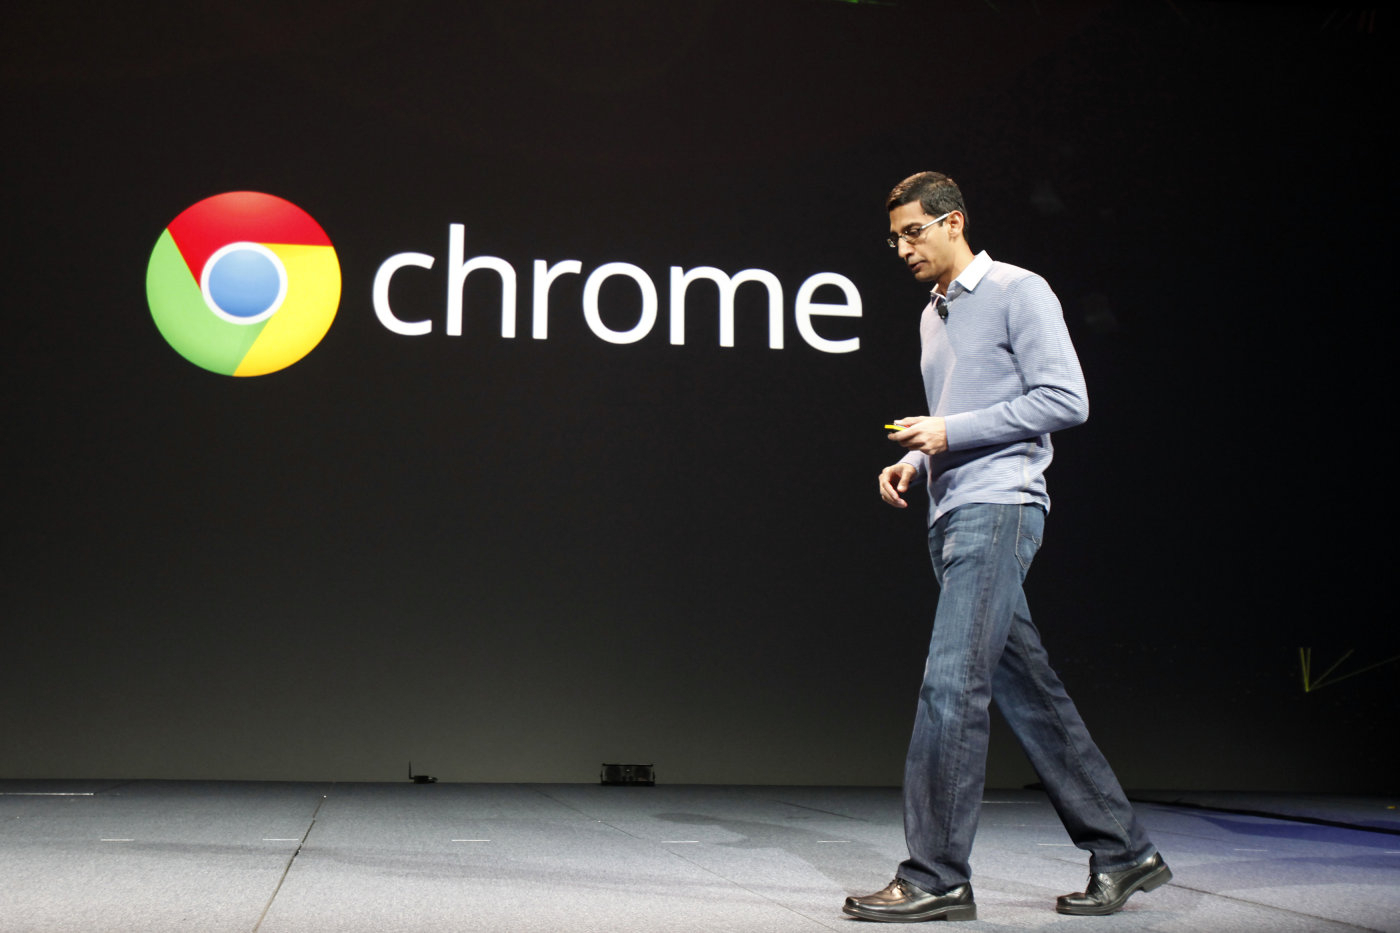 الآن نسخة Chrome 55 تدعم بشكل افتراضي HTML5